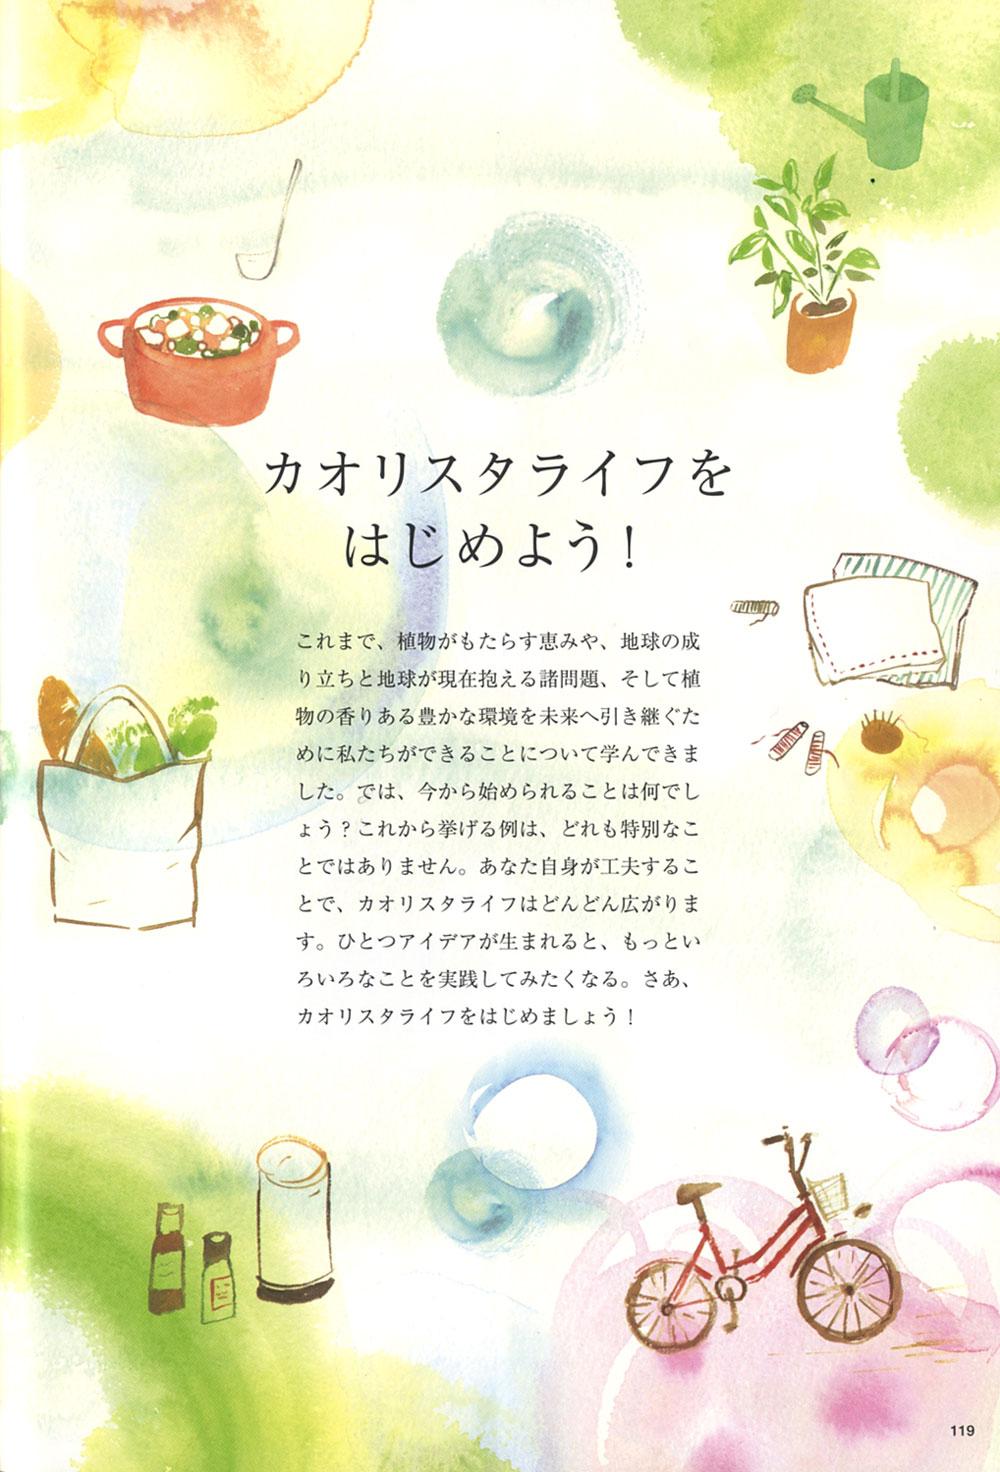 10_201106_kaorista_04